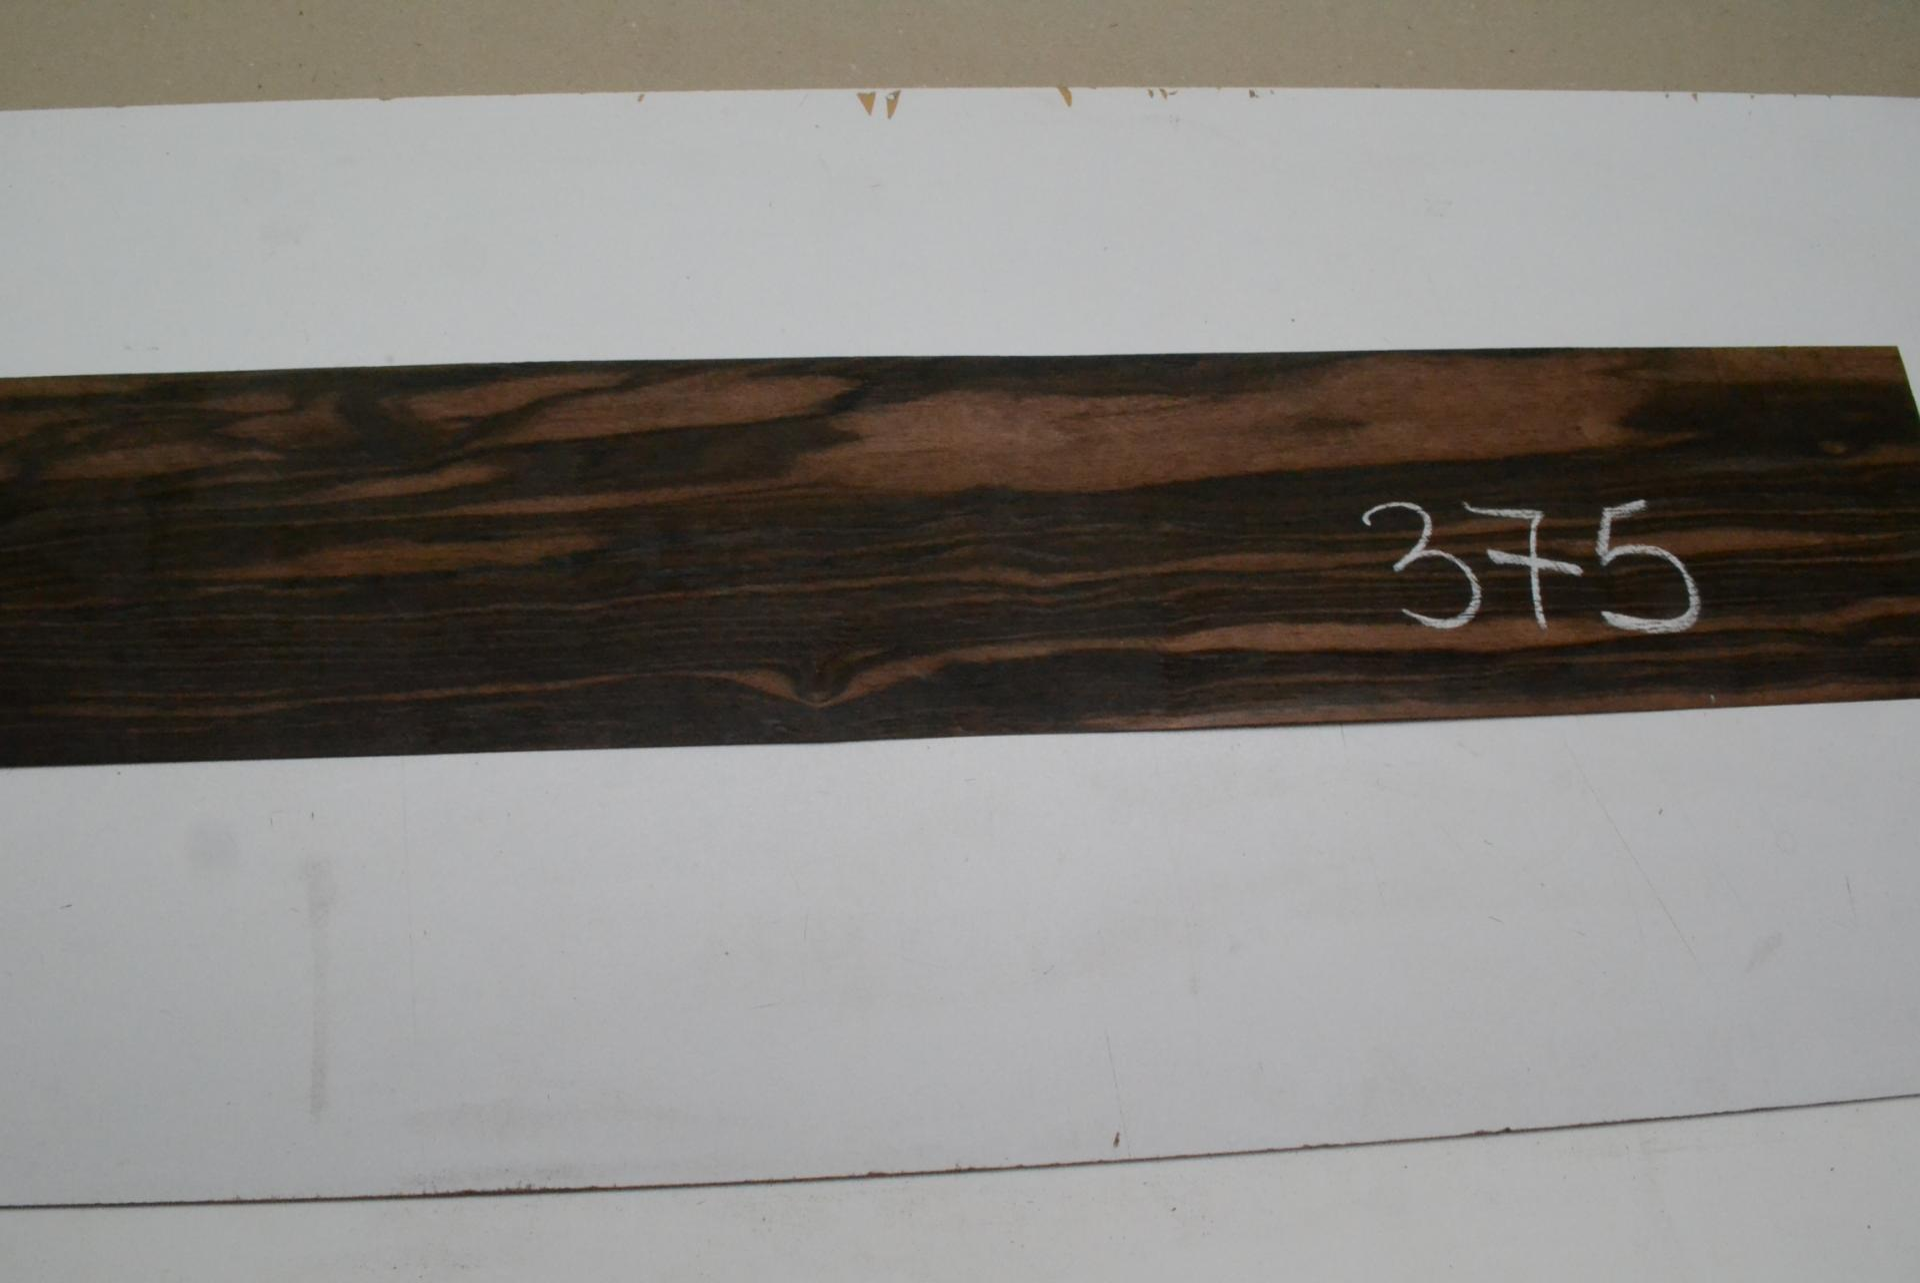 375 placage ebene de macassar marqueterie 1